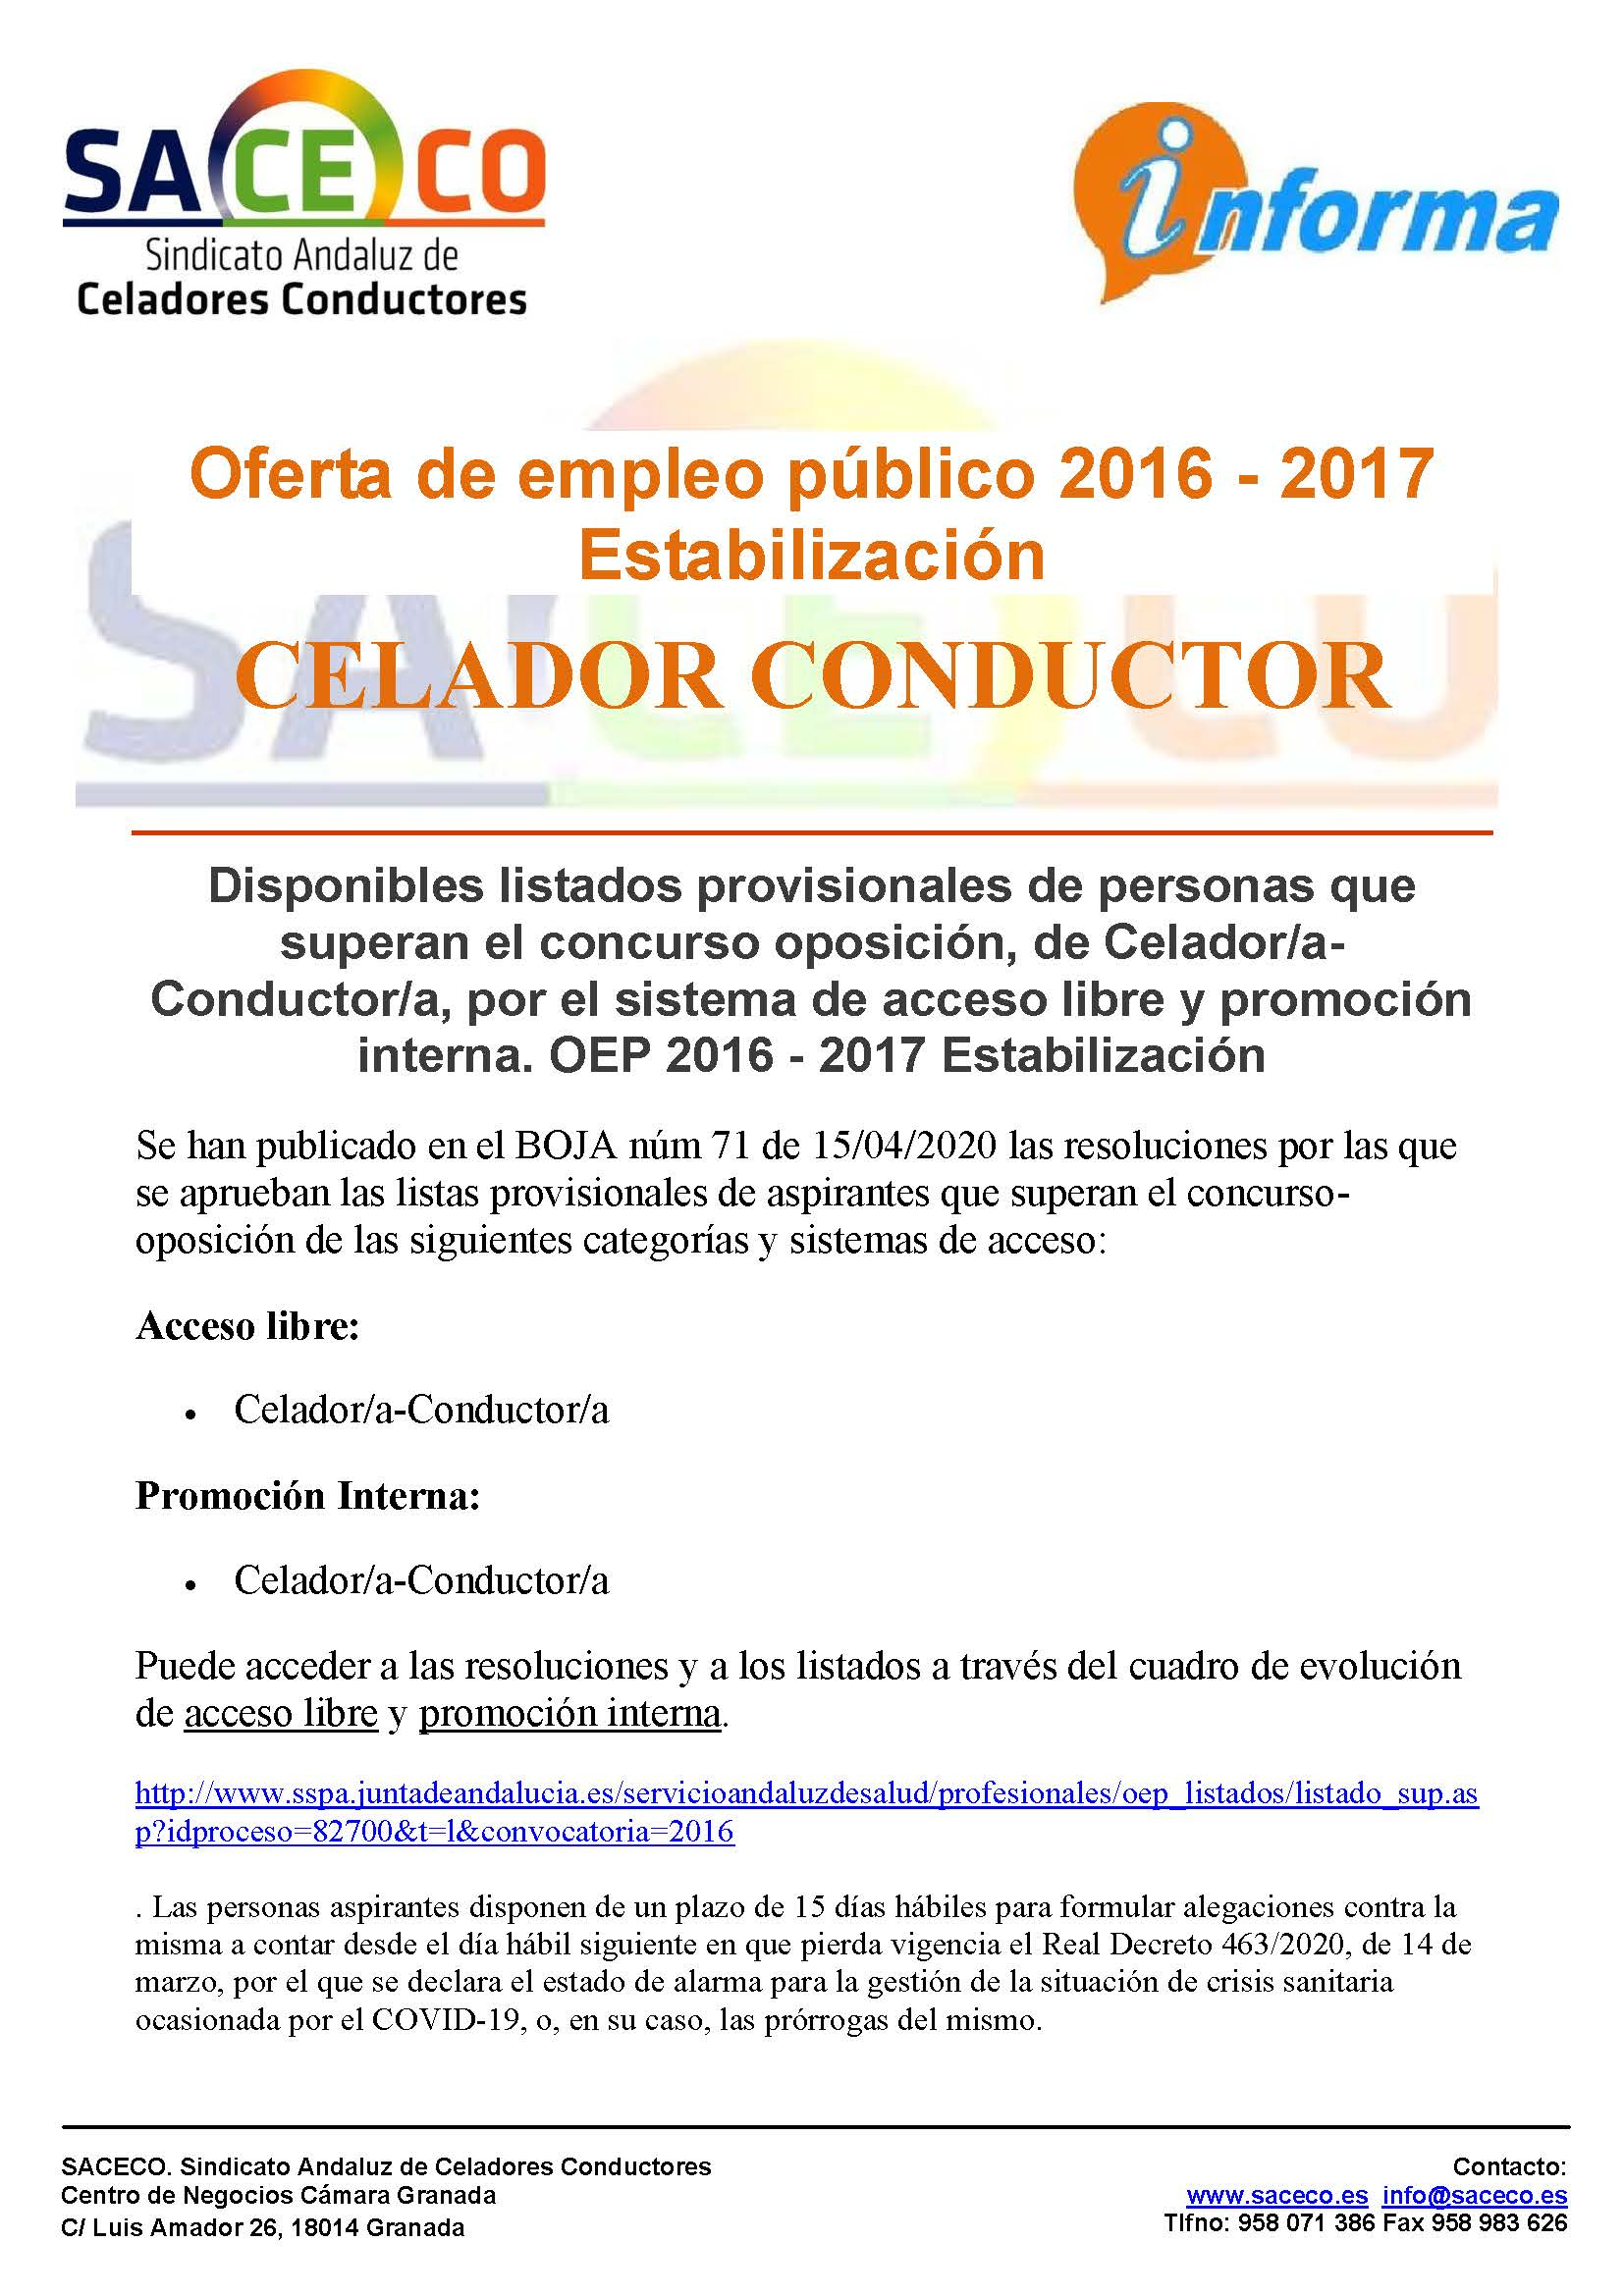 OPE 2016 CELADOR CONDUCTOR